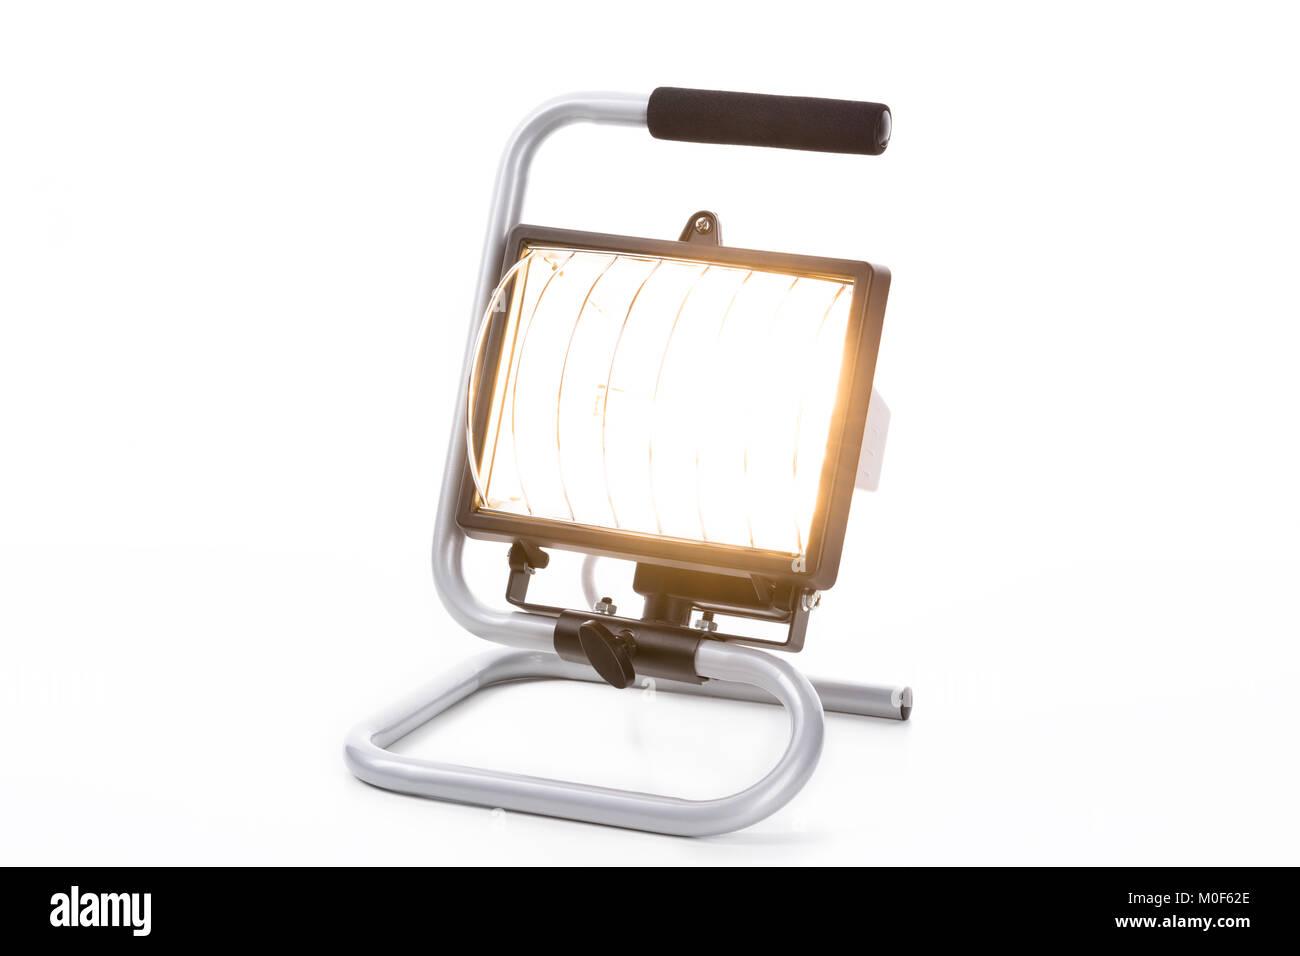 Construction light isolated on white background, closeup, with burning halogen light - Stock Image